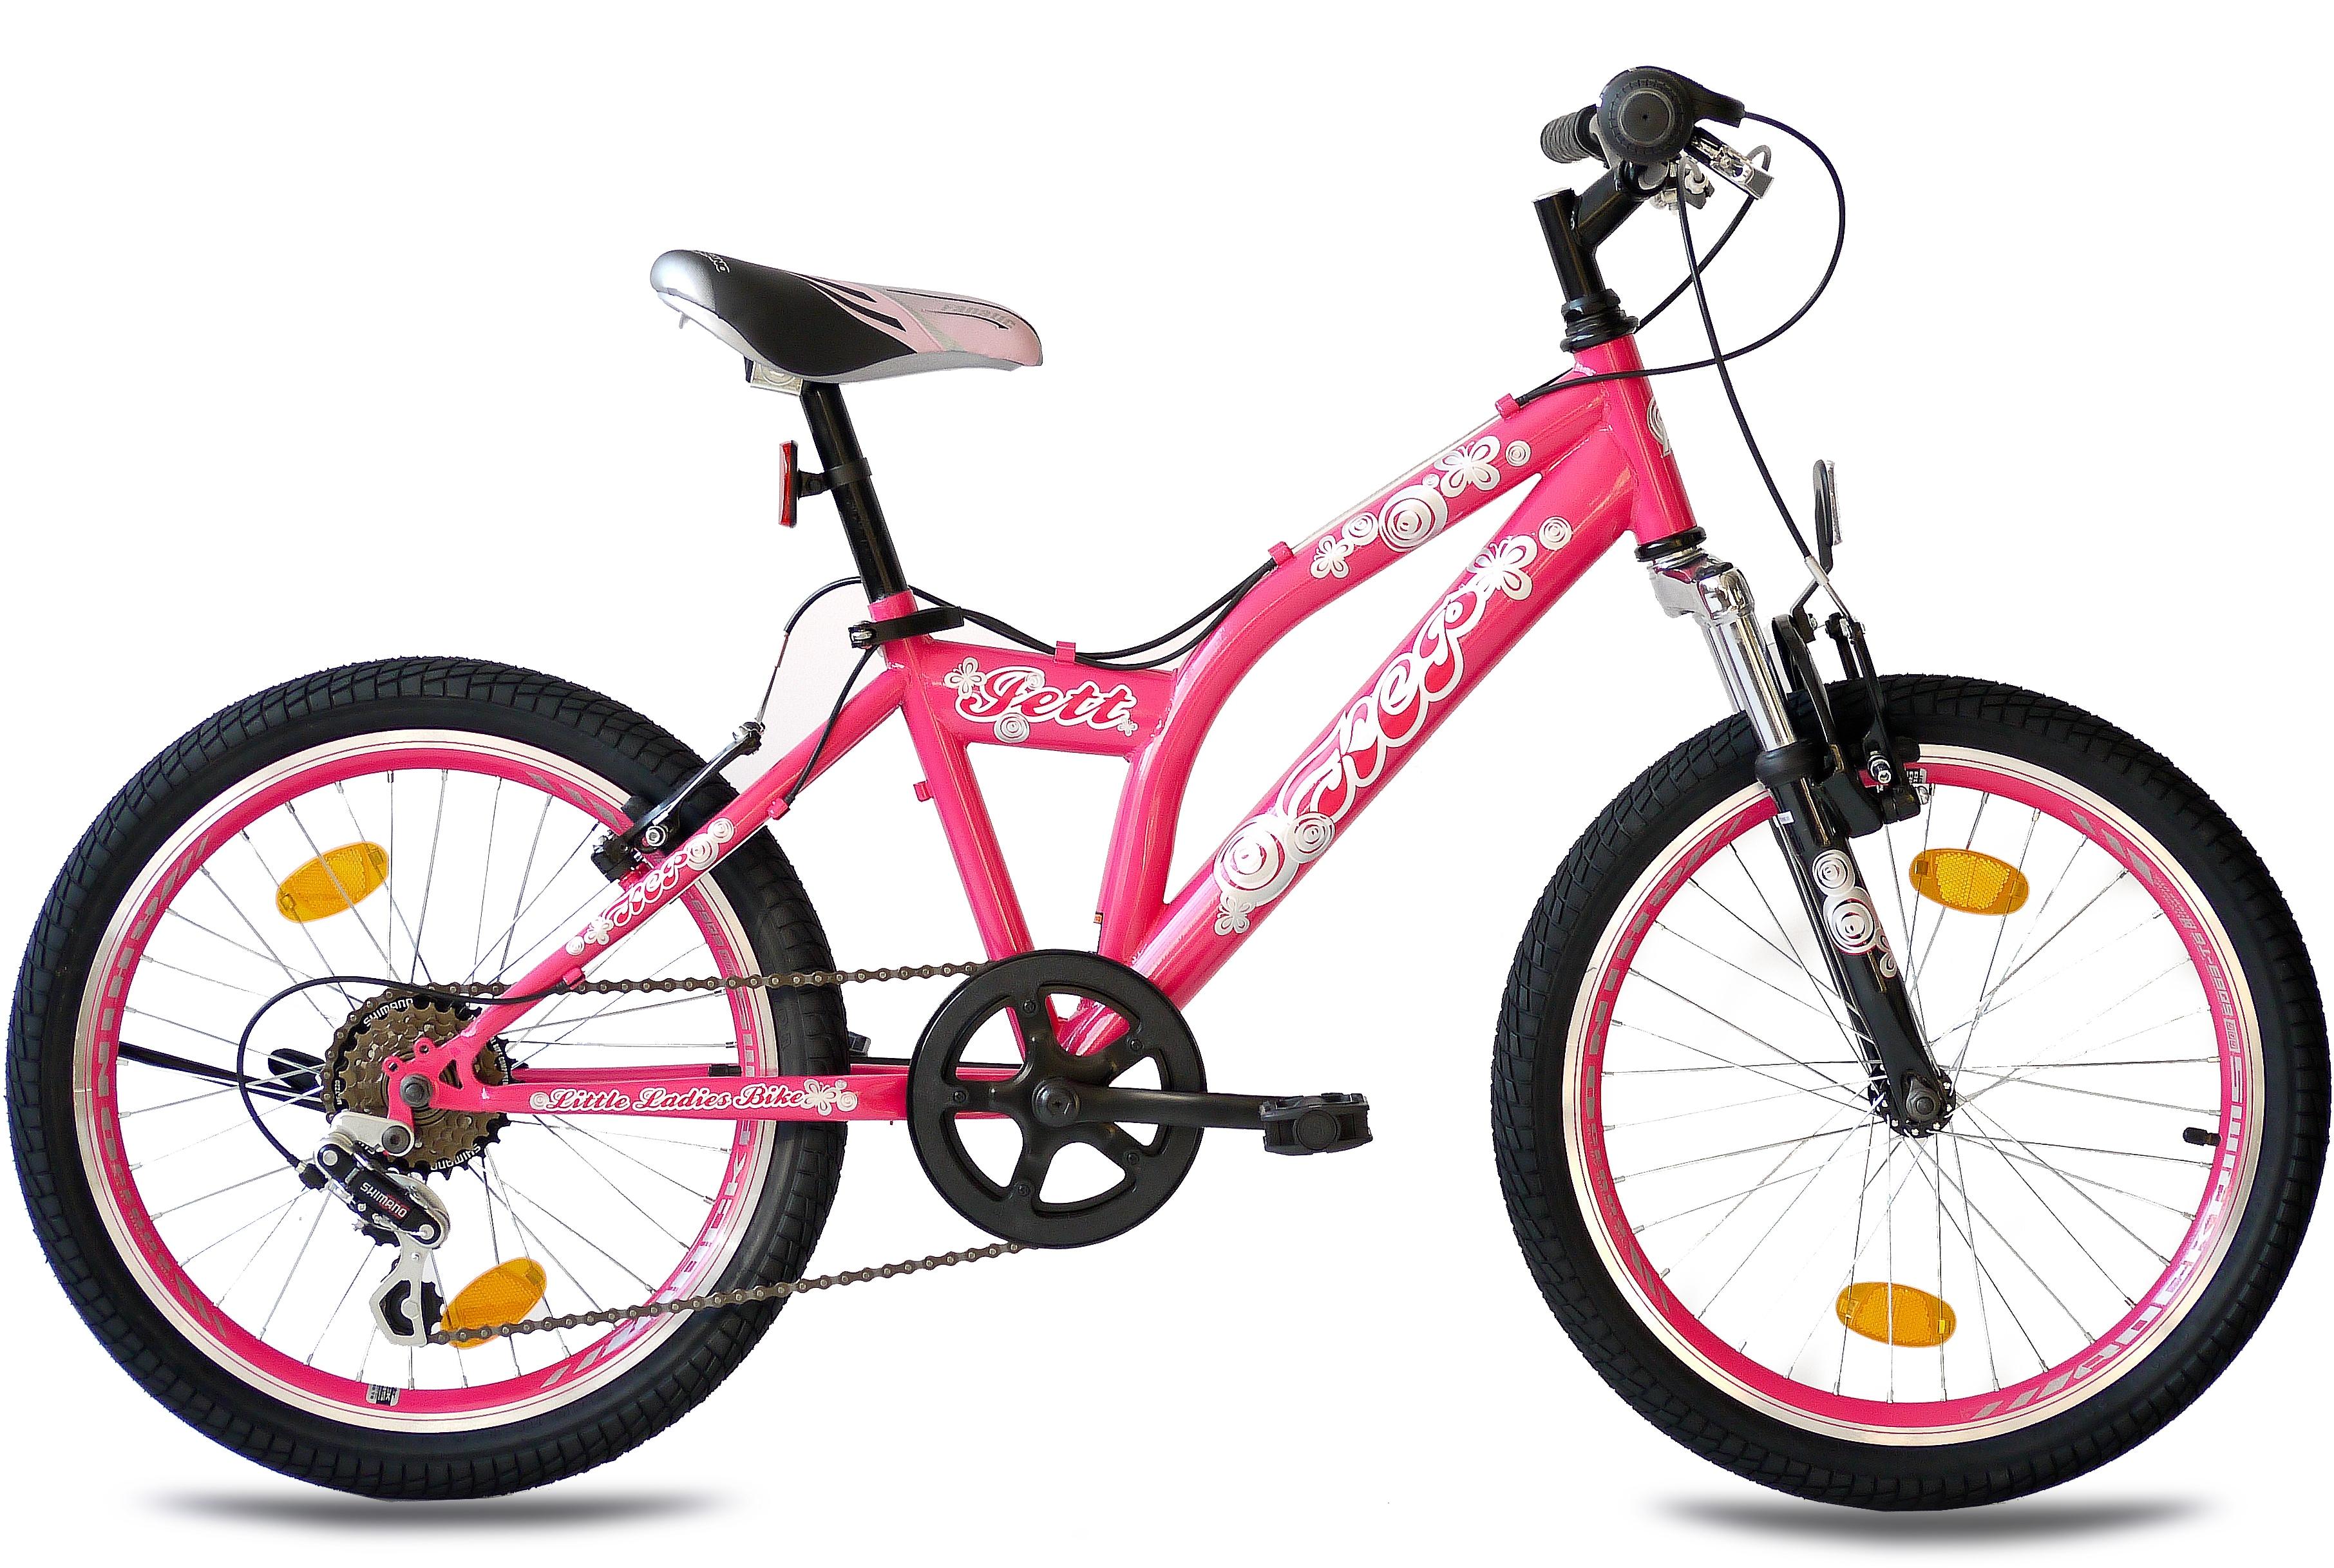 KCP Kinderfahrrad Jett SF, 6 Gang, Shimano, Tourney RD-TZ500-GS Schaltwerk, Kettenschaltung rosa Kinder Kinderfahrräder Fahrräder Zubehör